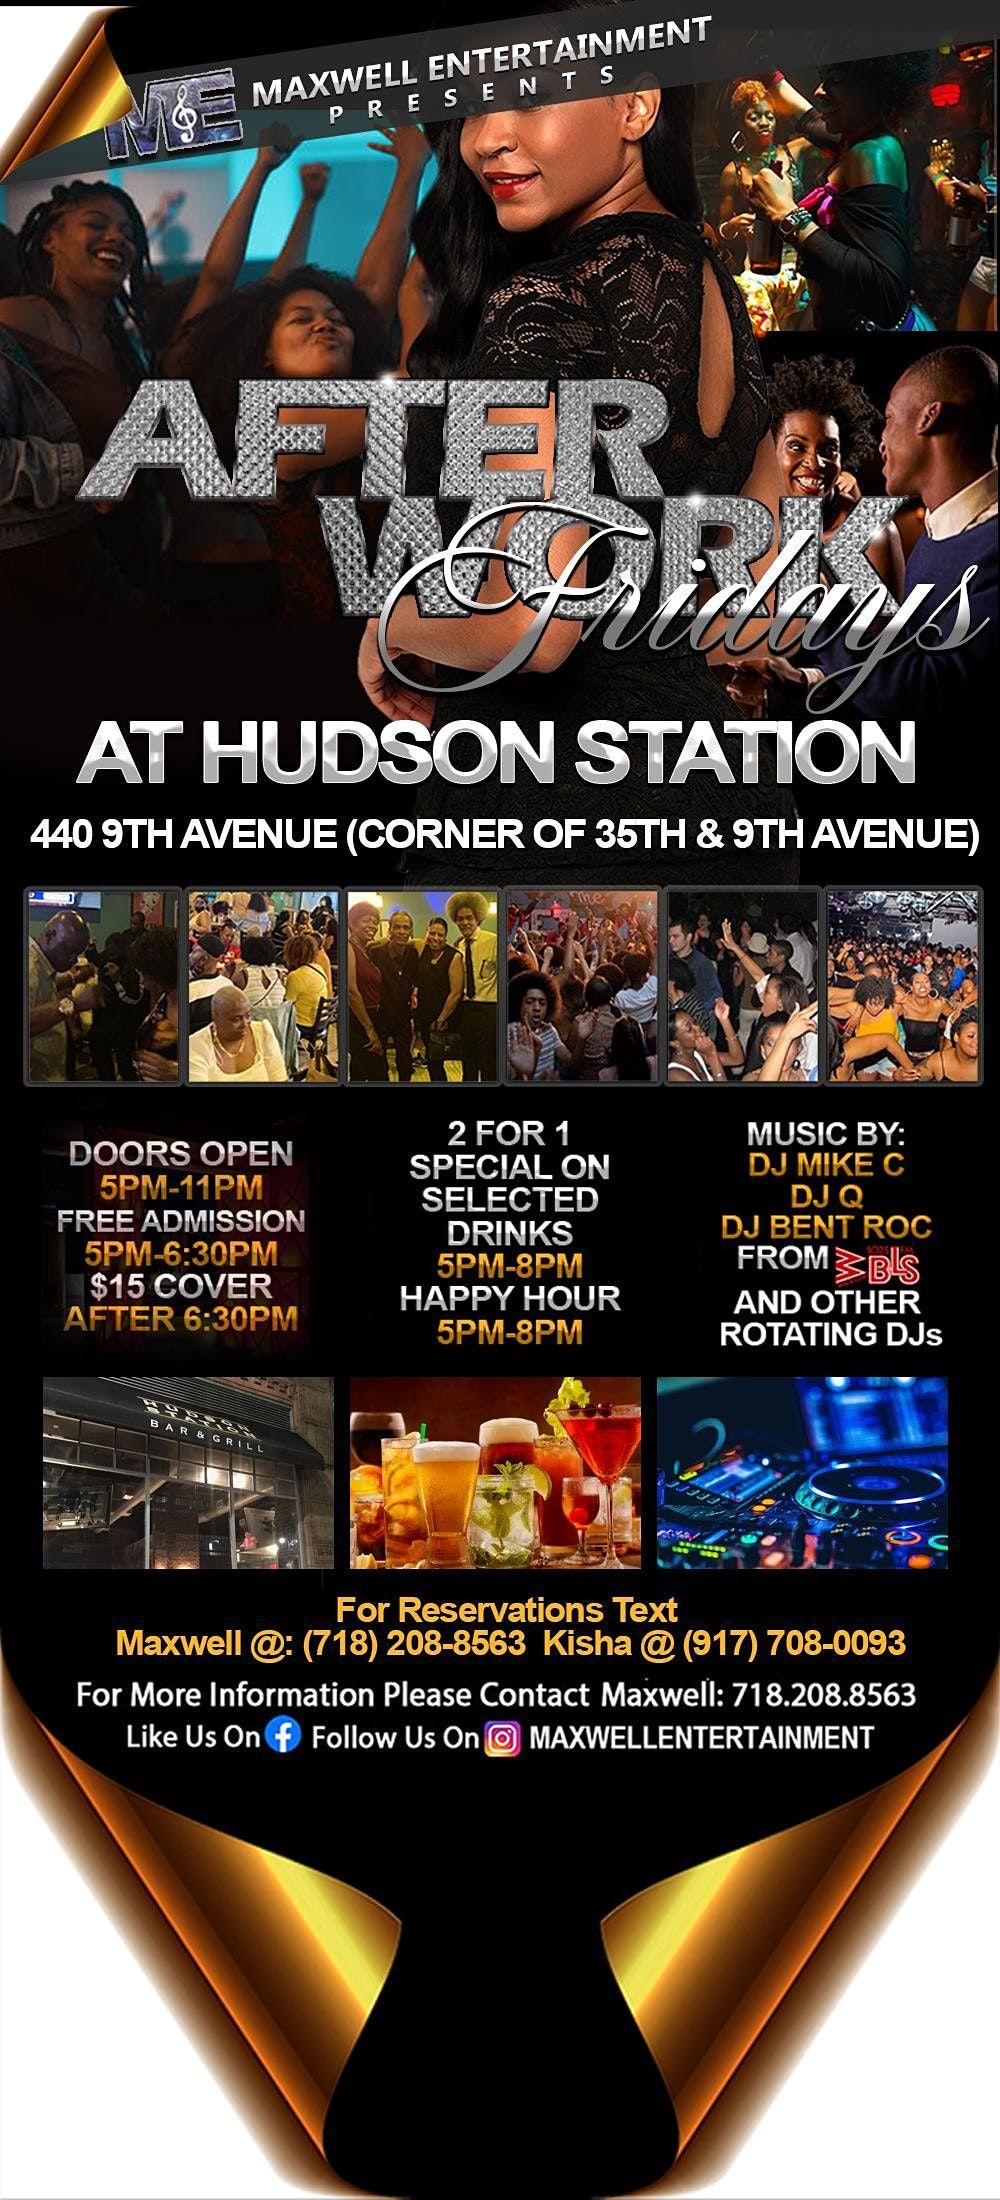 Afterwork Friday's at Hudson Station